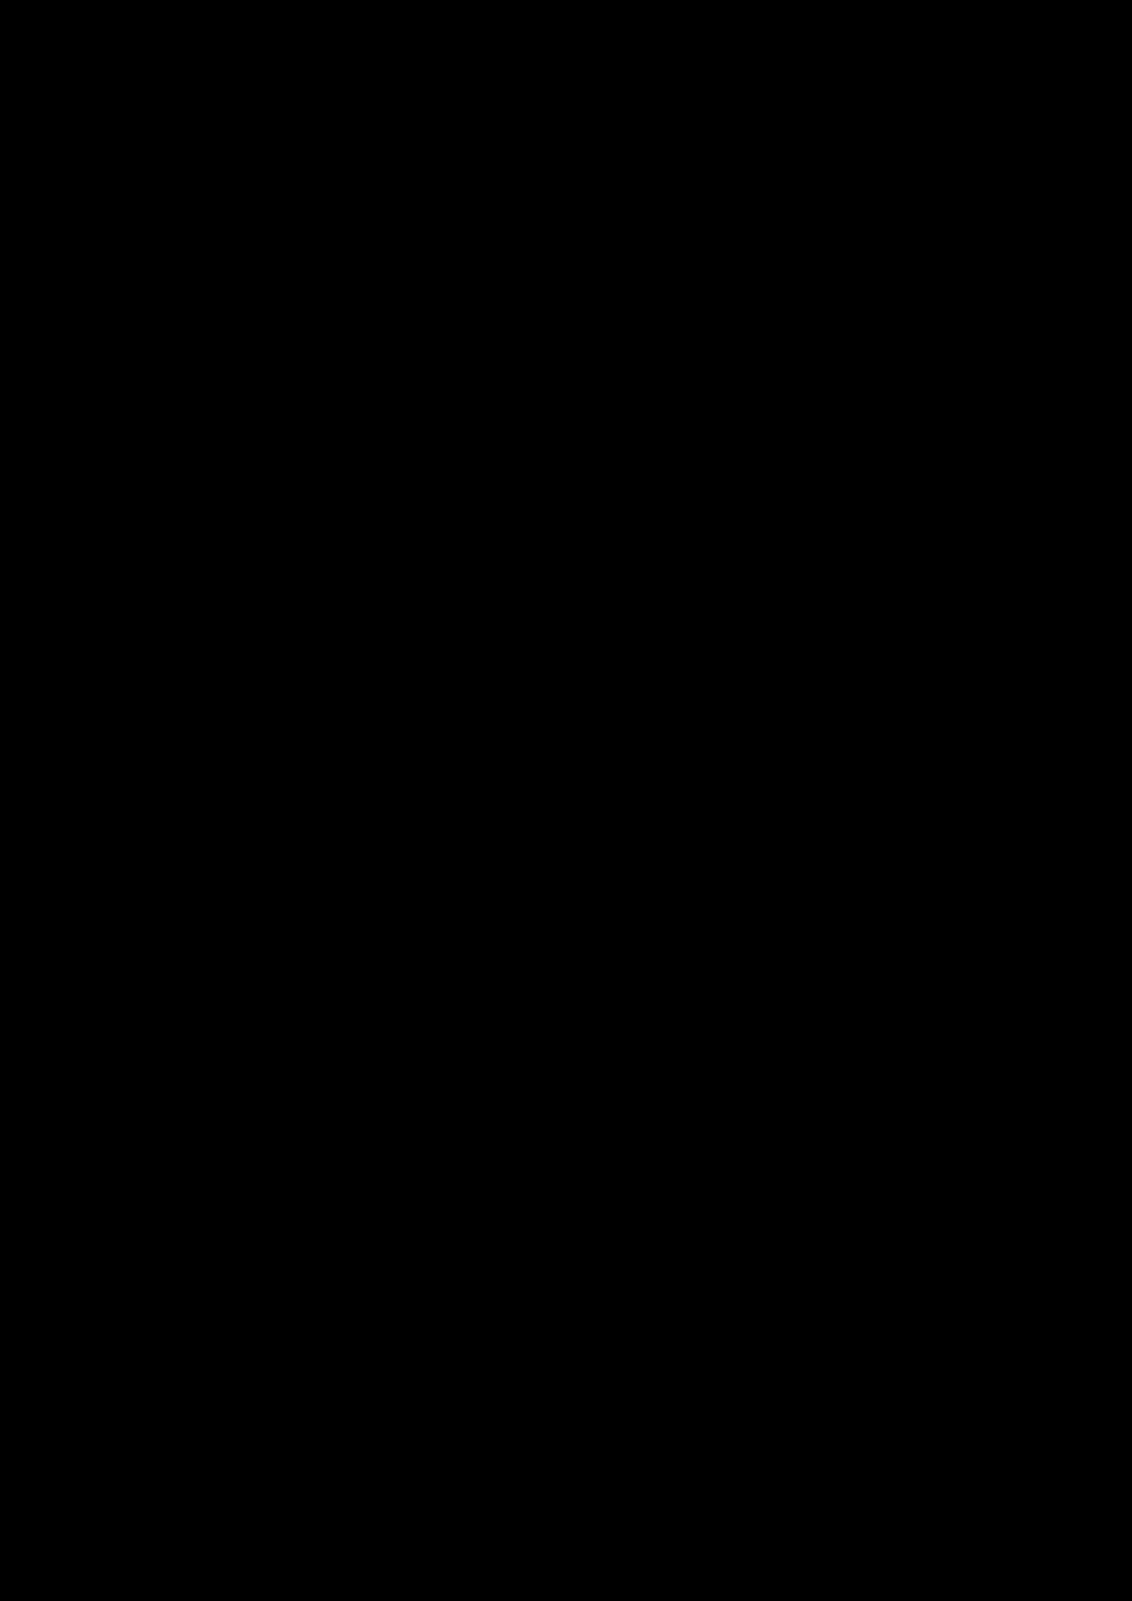 Ispoved Pervogo Boga slide, Image 50